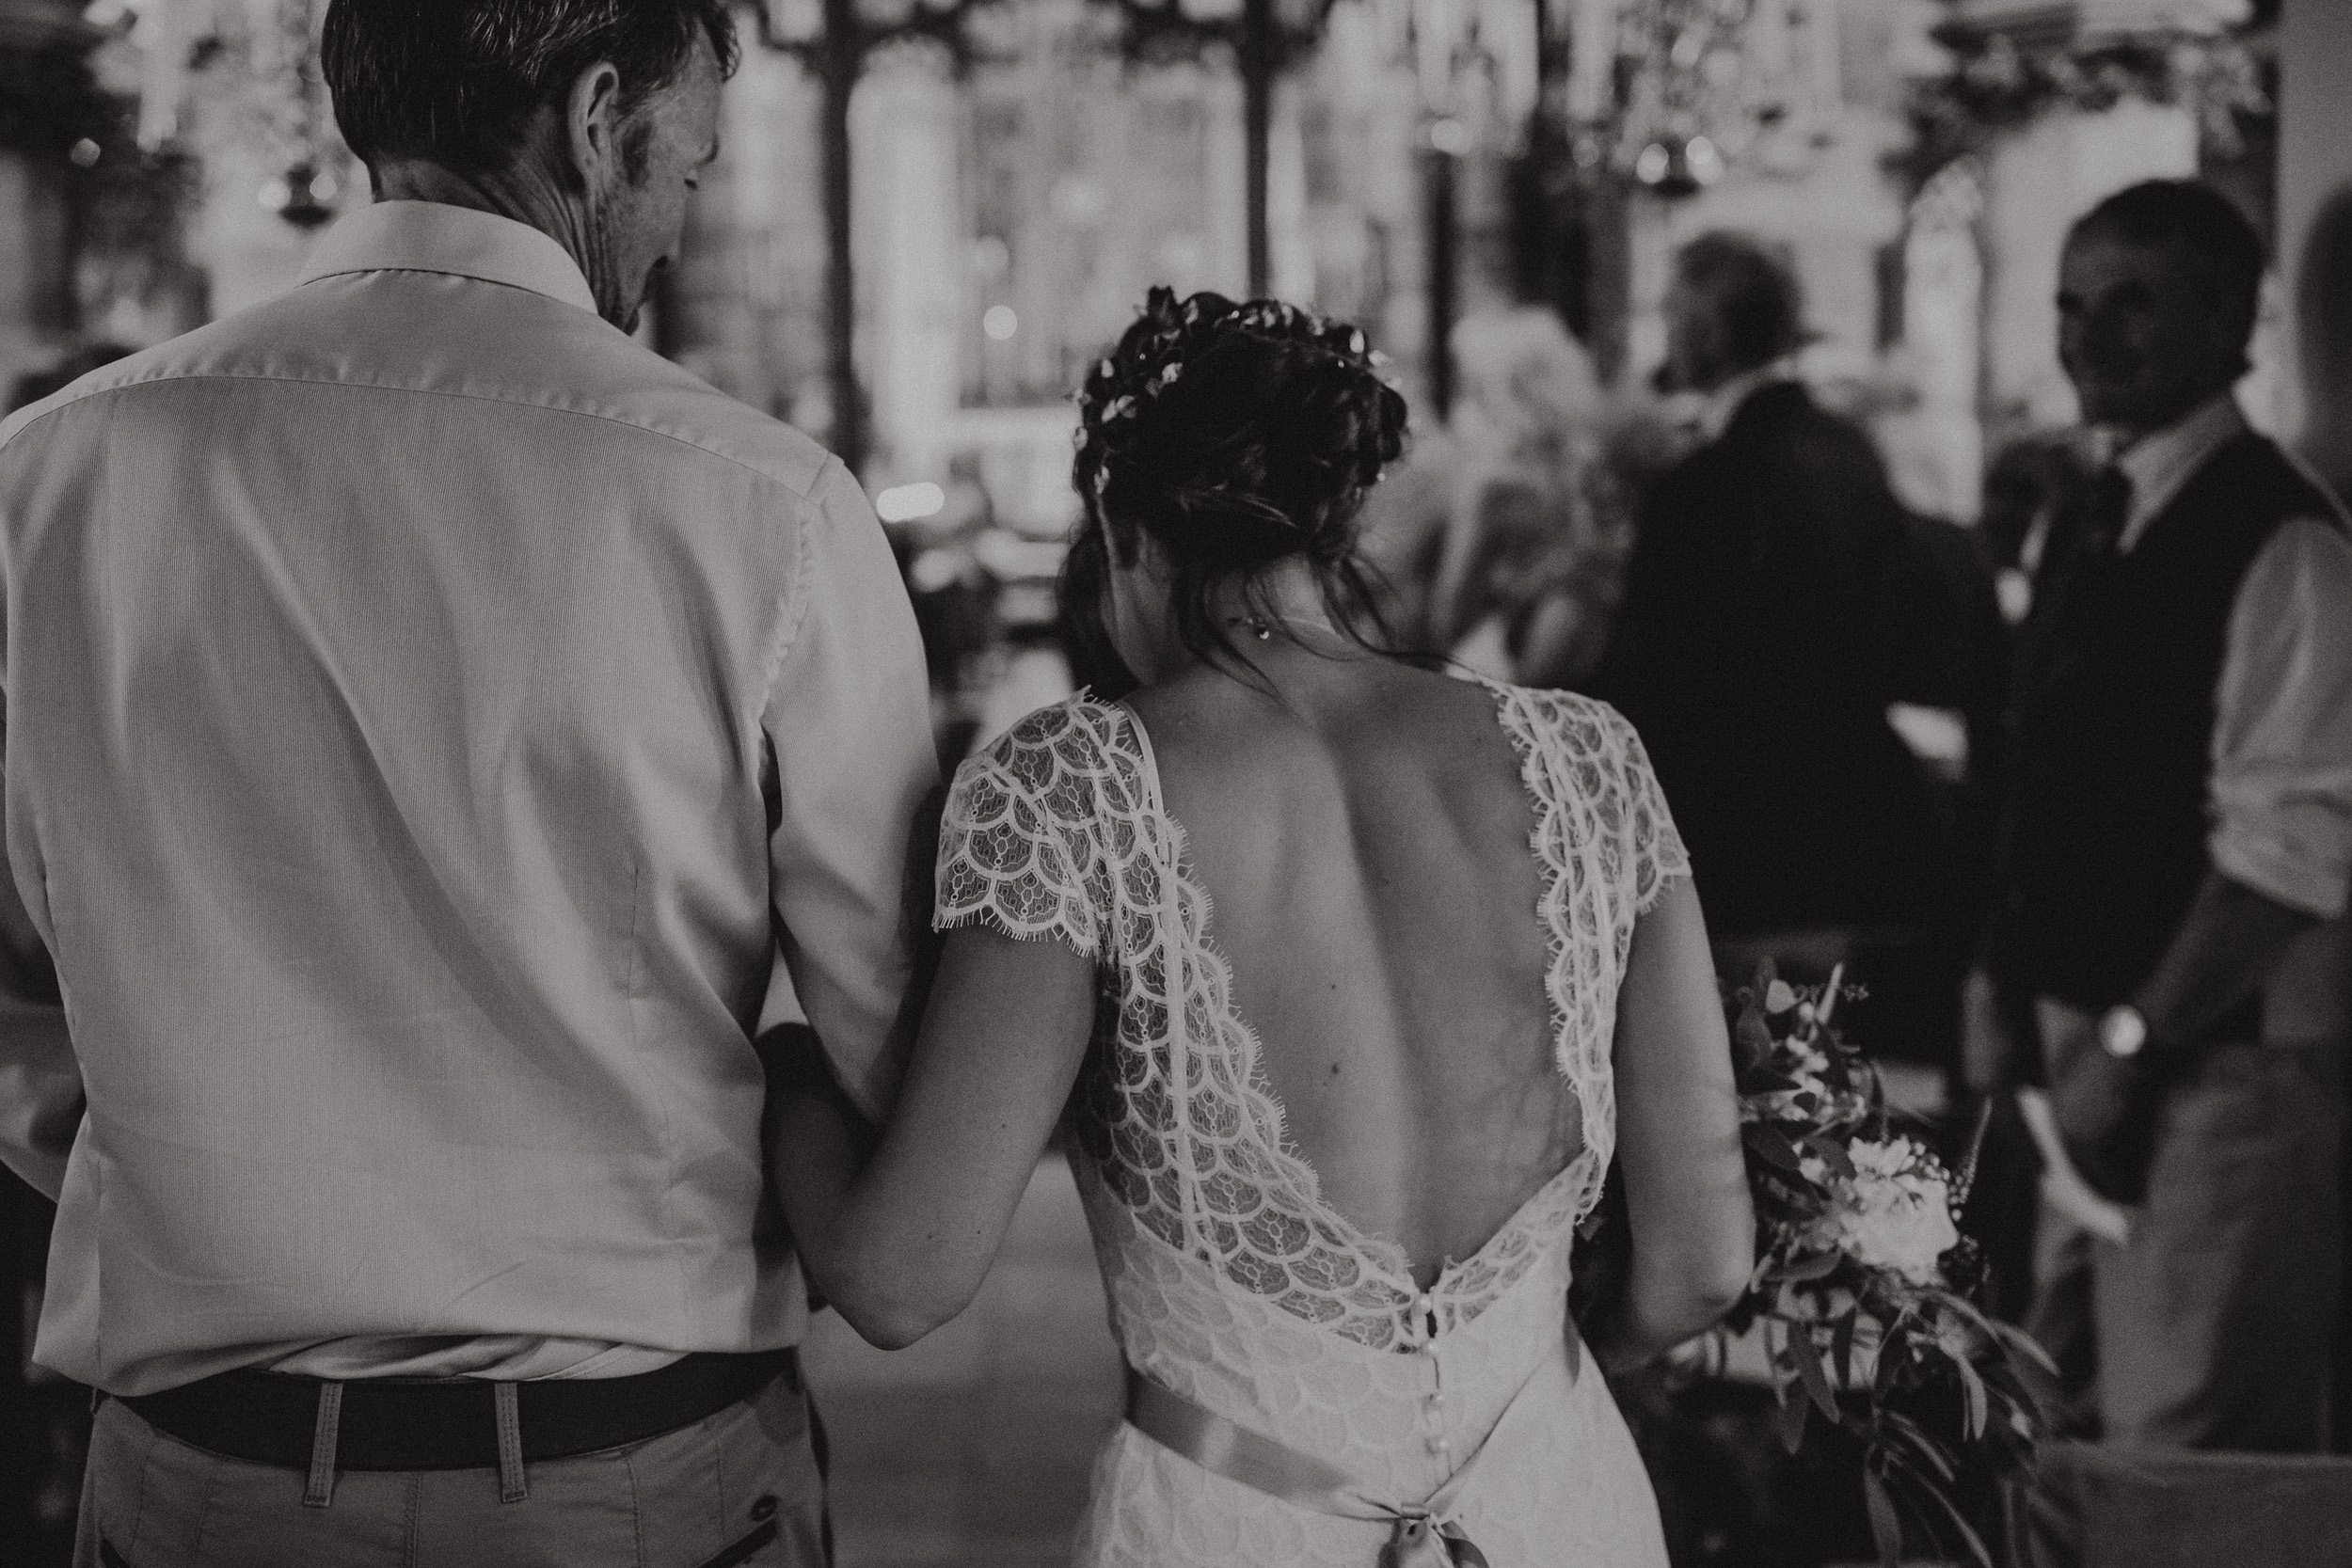 Martha-Laid-Back-Garden-Wedding-Lace-Wedding-Dress-Bohemian-Kate-Beaumont-12.jpg